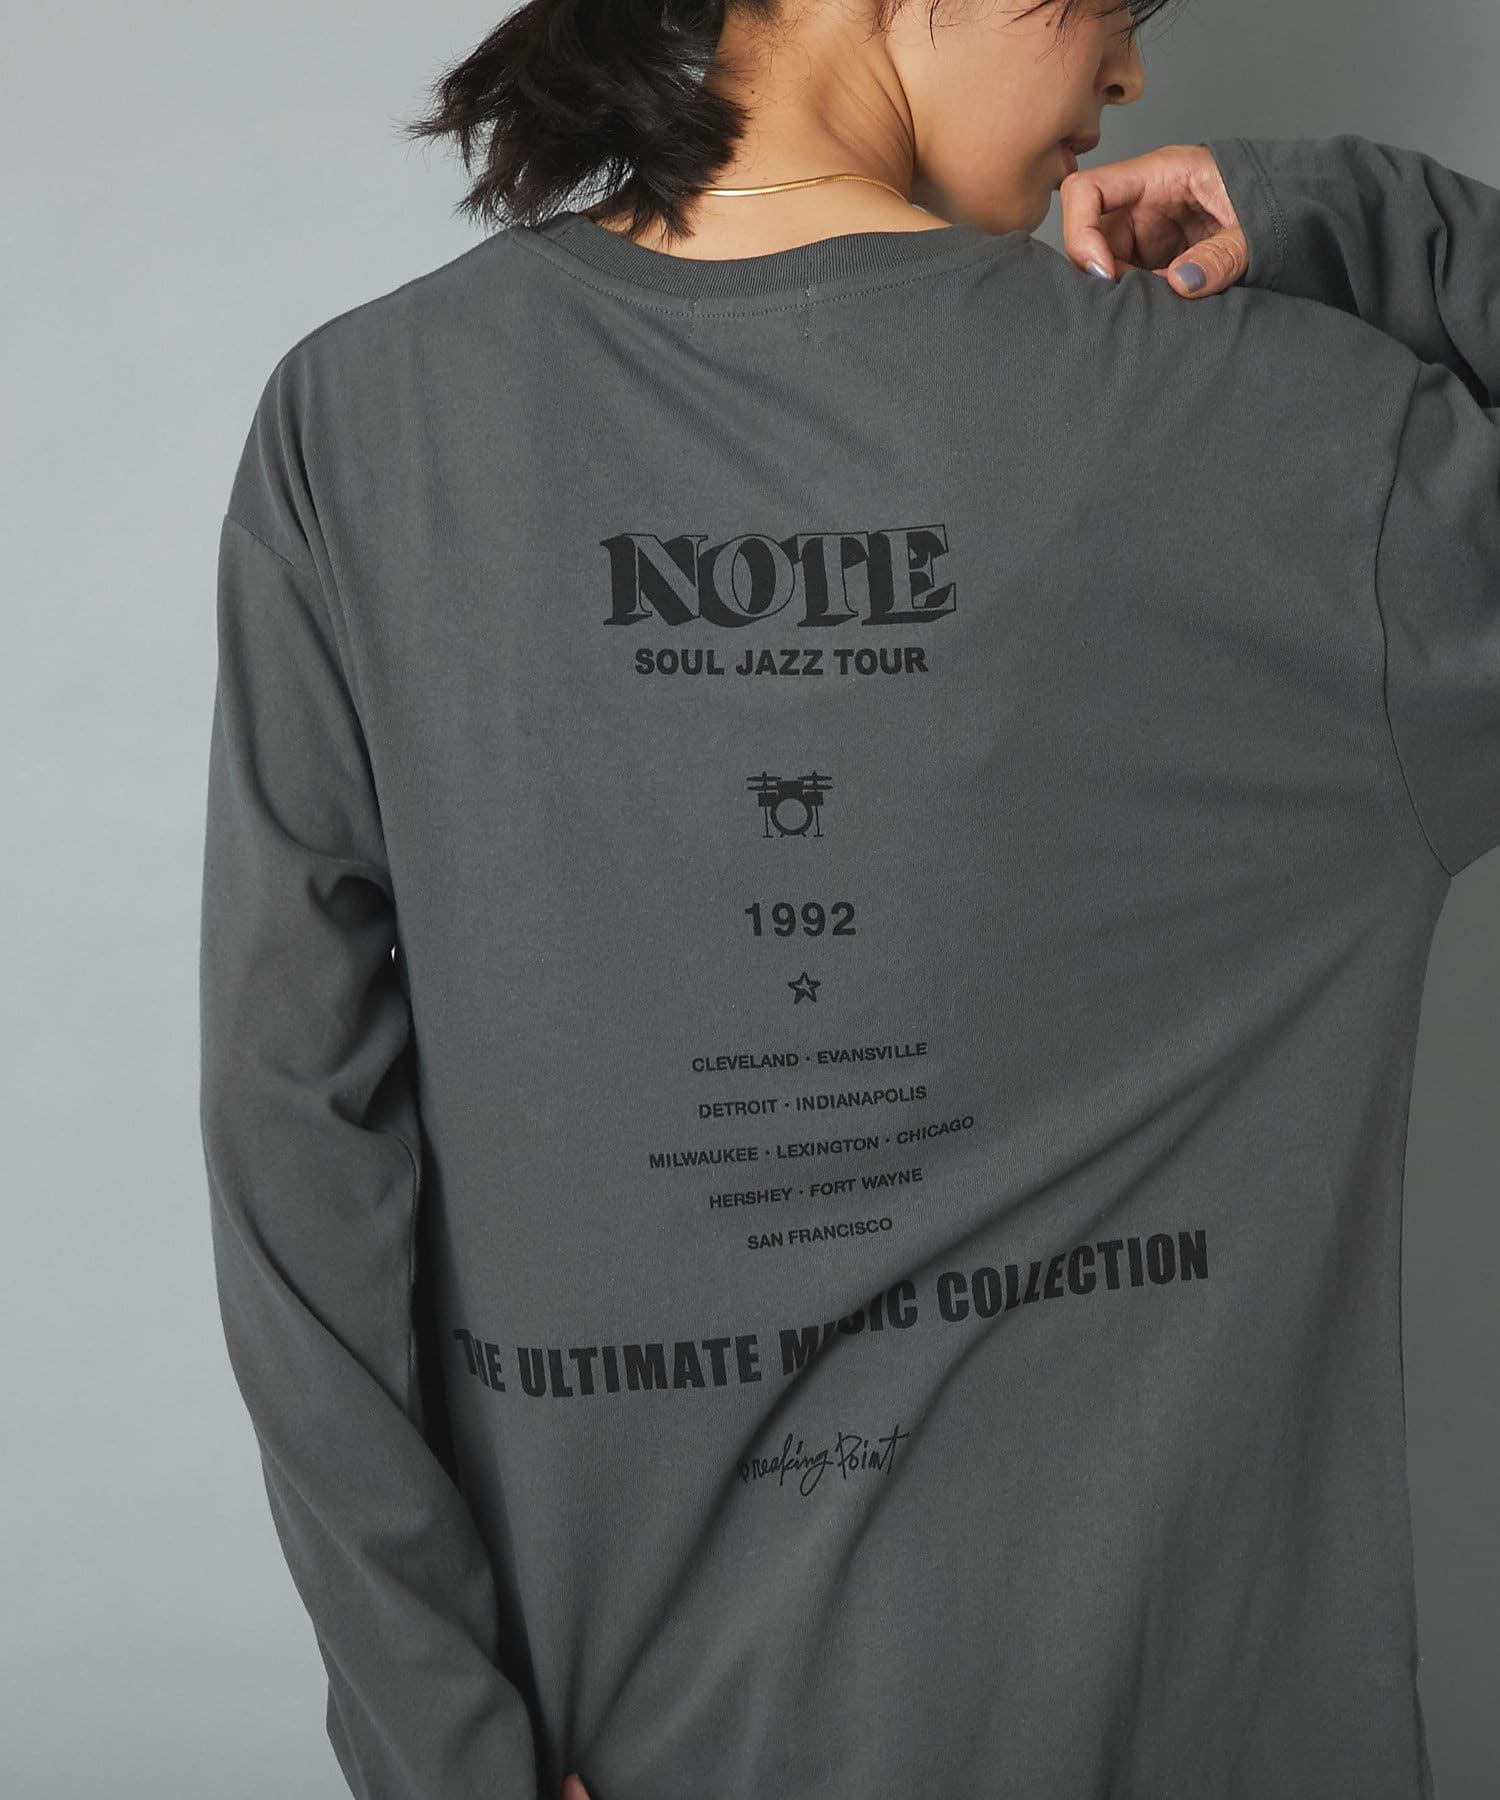 RIVE DROITE(リヴドロワ) 【一枚でサマになる】JAZZTOURロンT